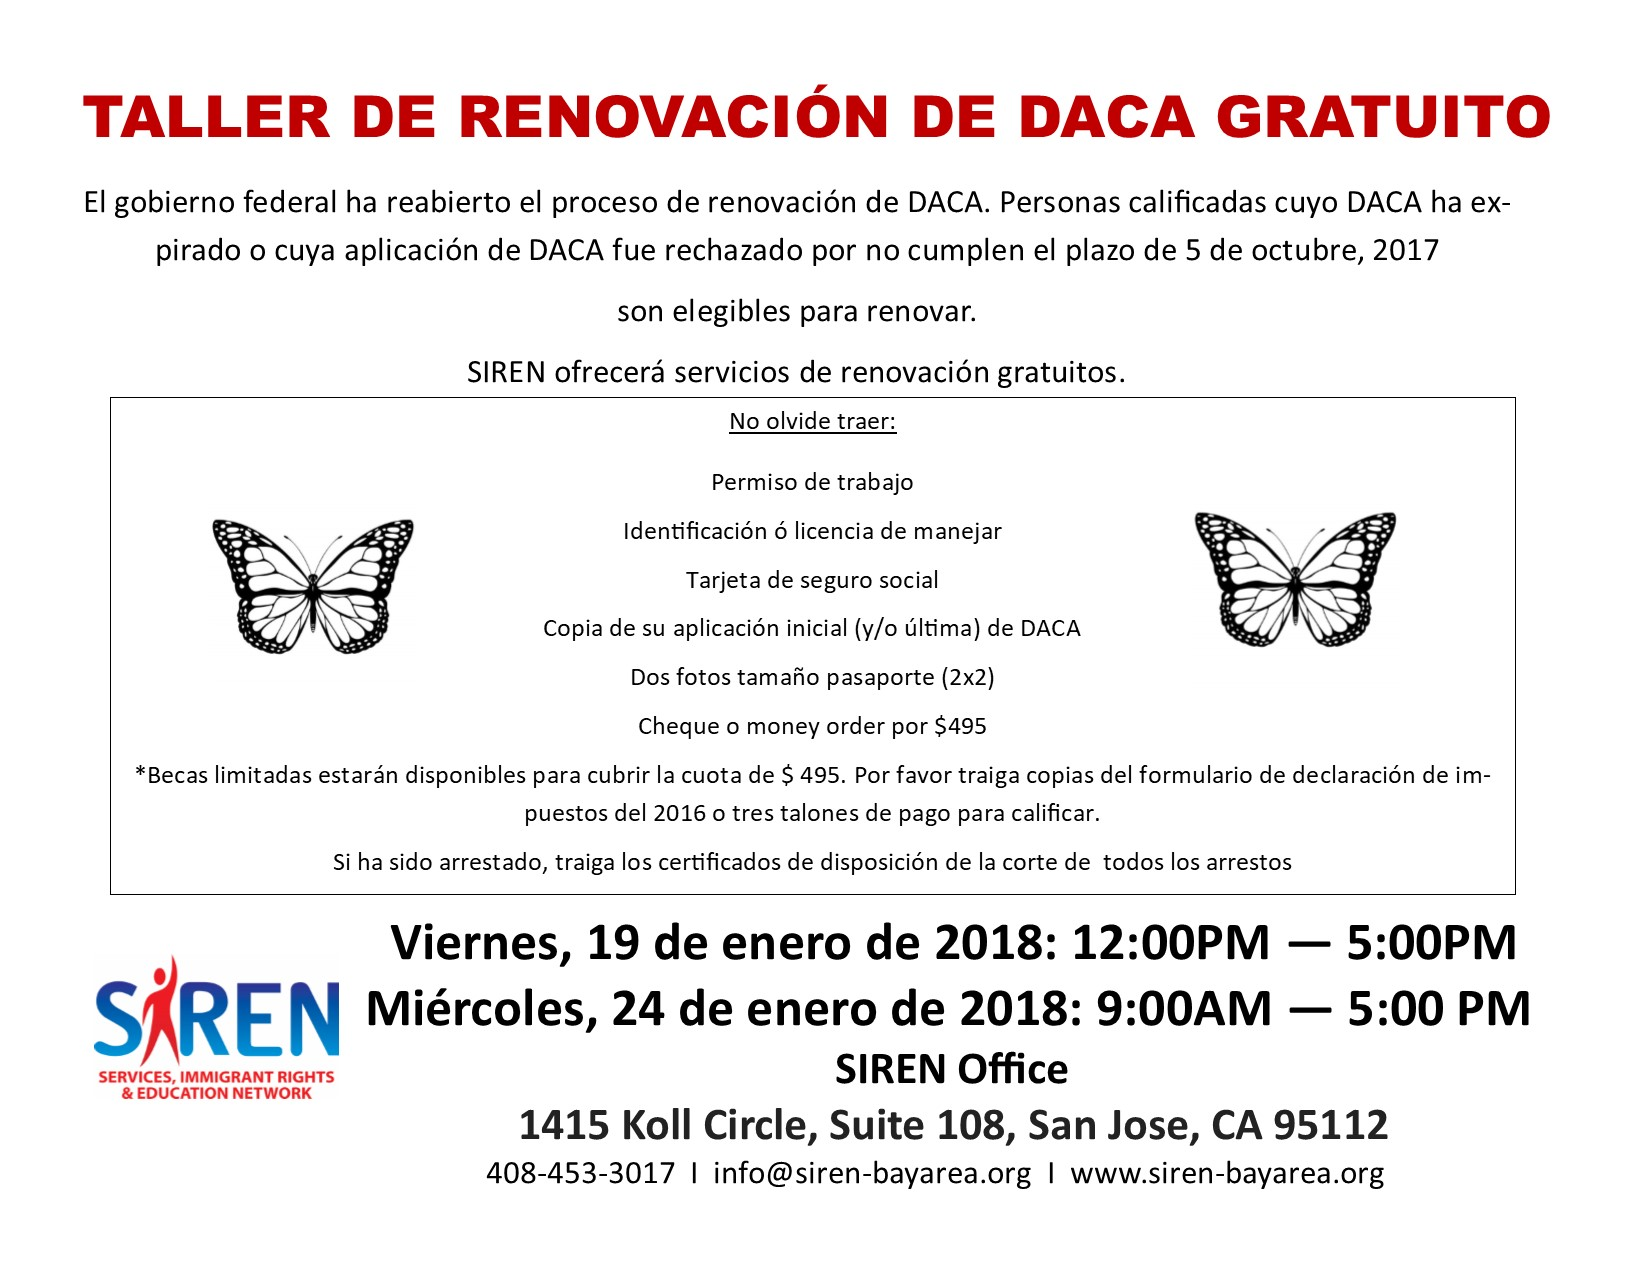 DACA clinic spanish.JPG